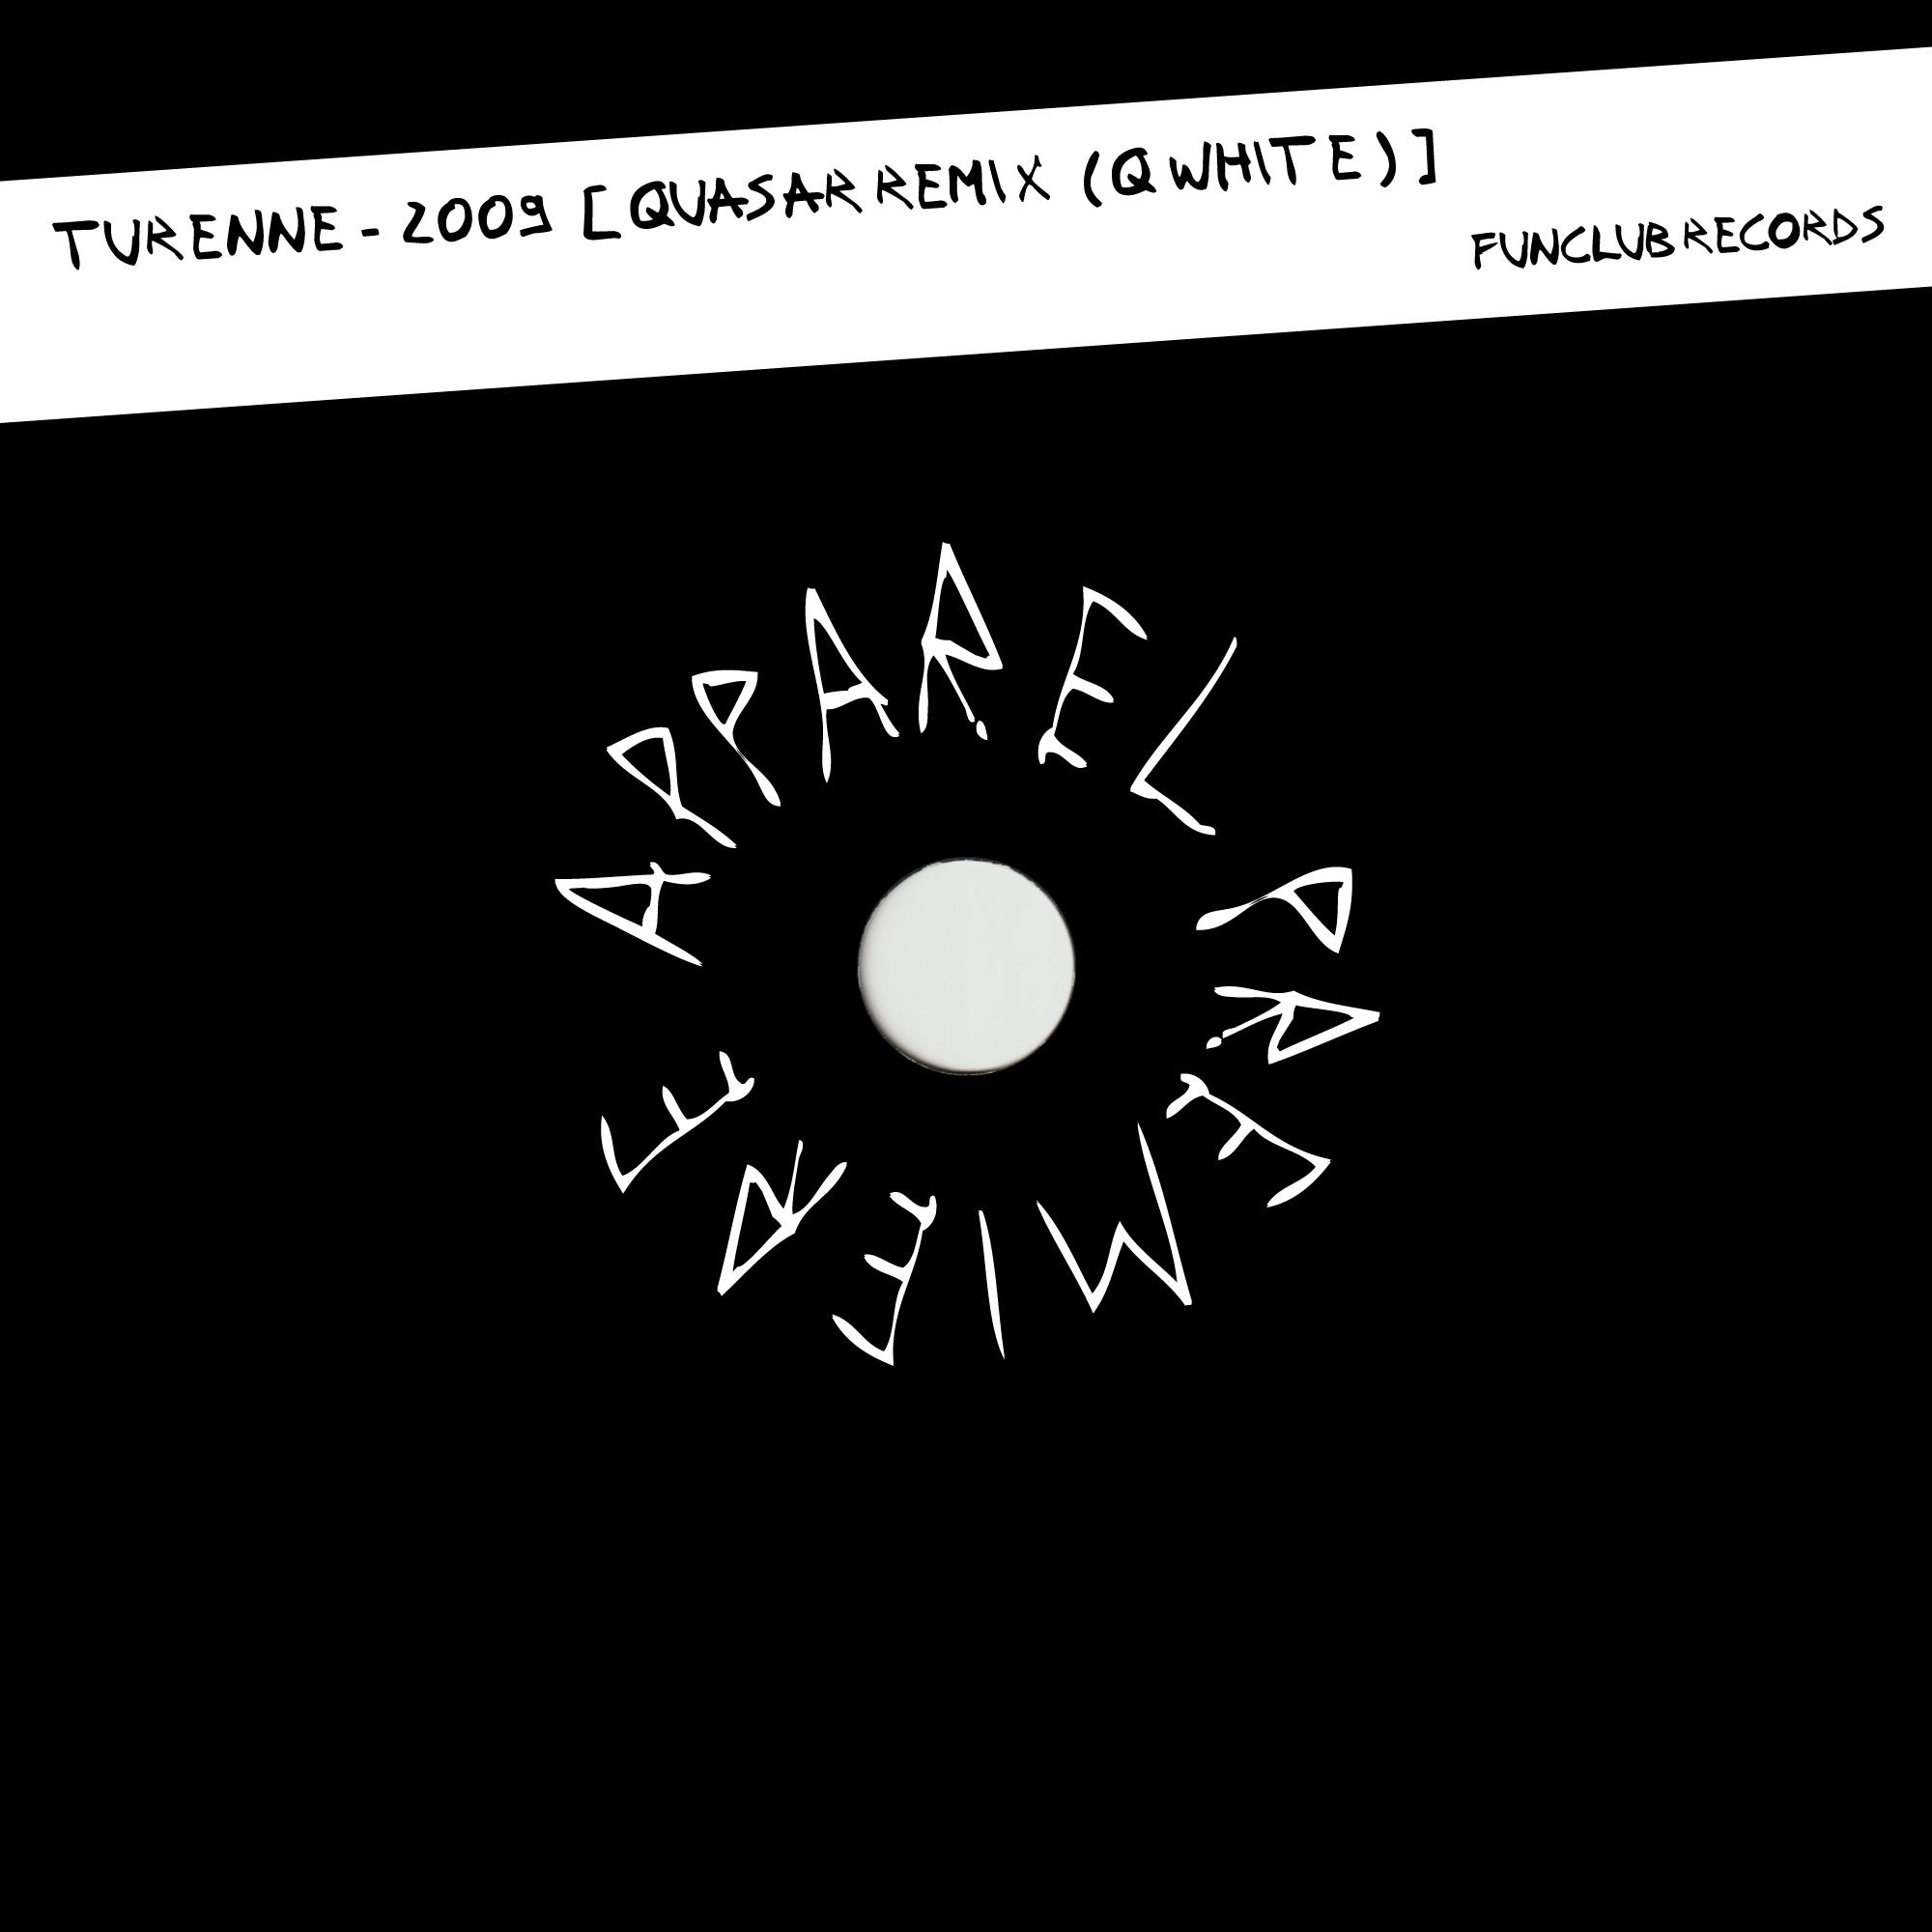 Apparel-Premiere_FUNCLUB